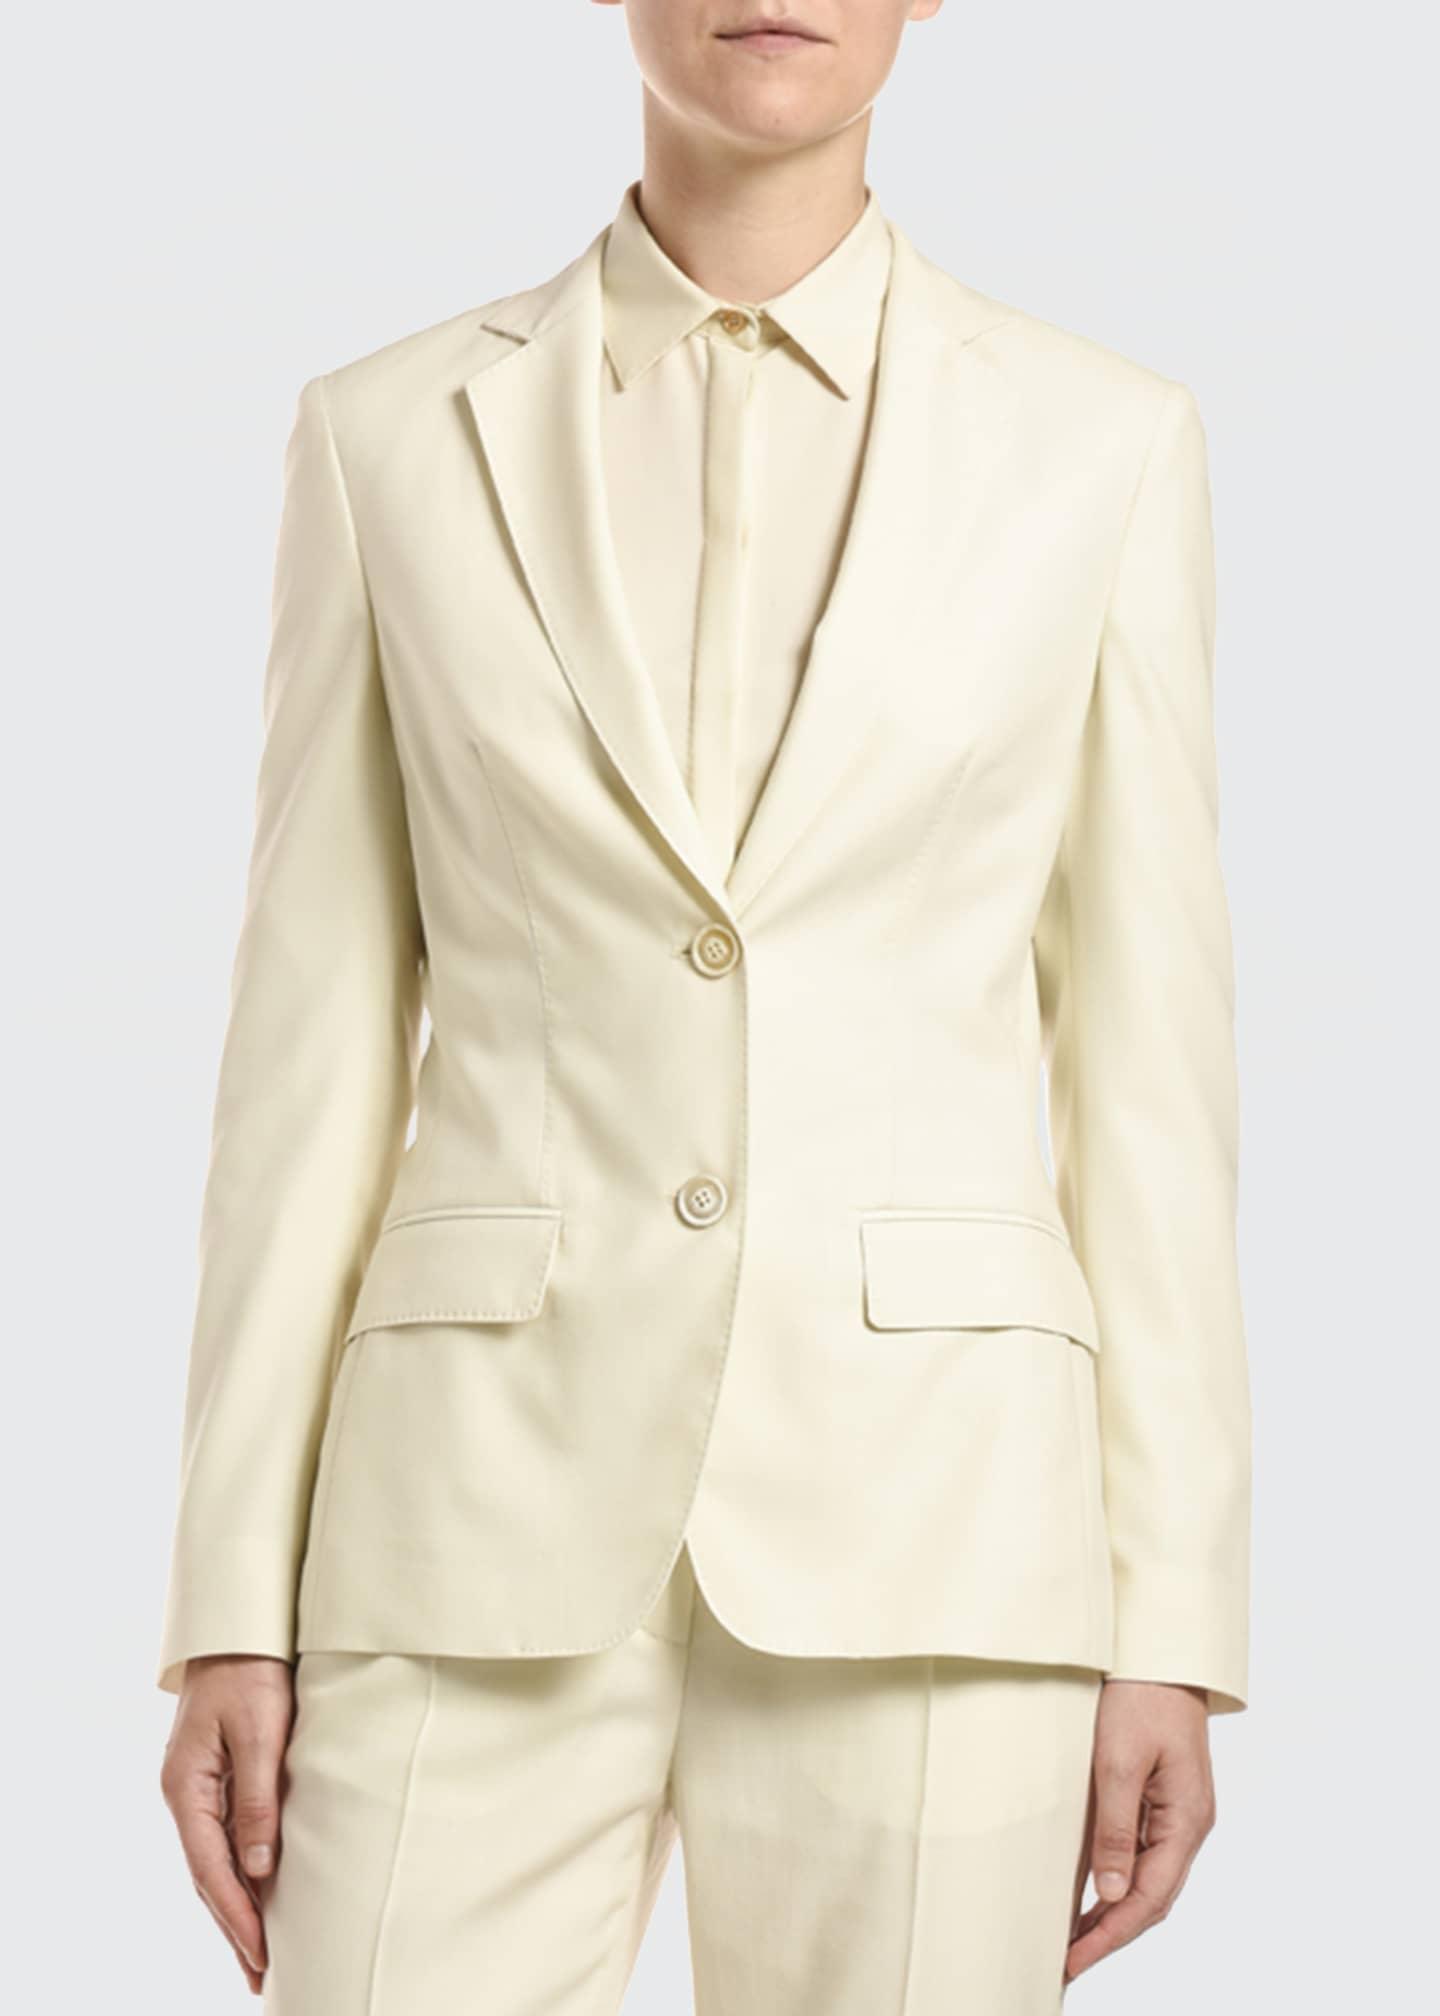 Agnona Single-Breasted Wool Jacket